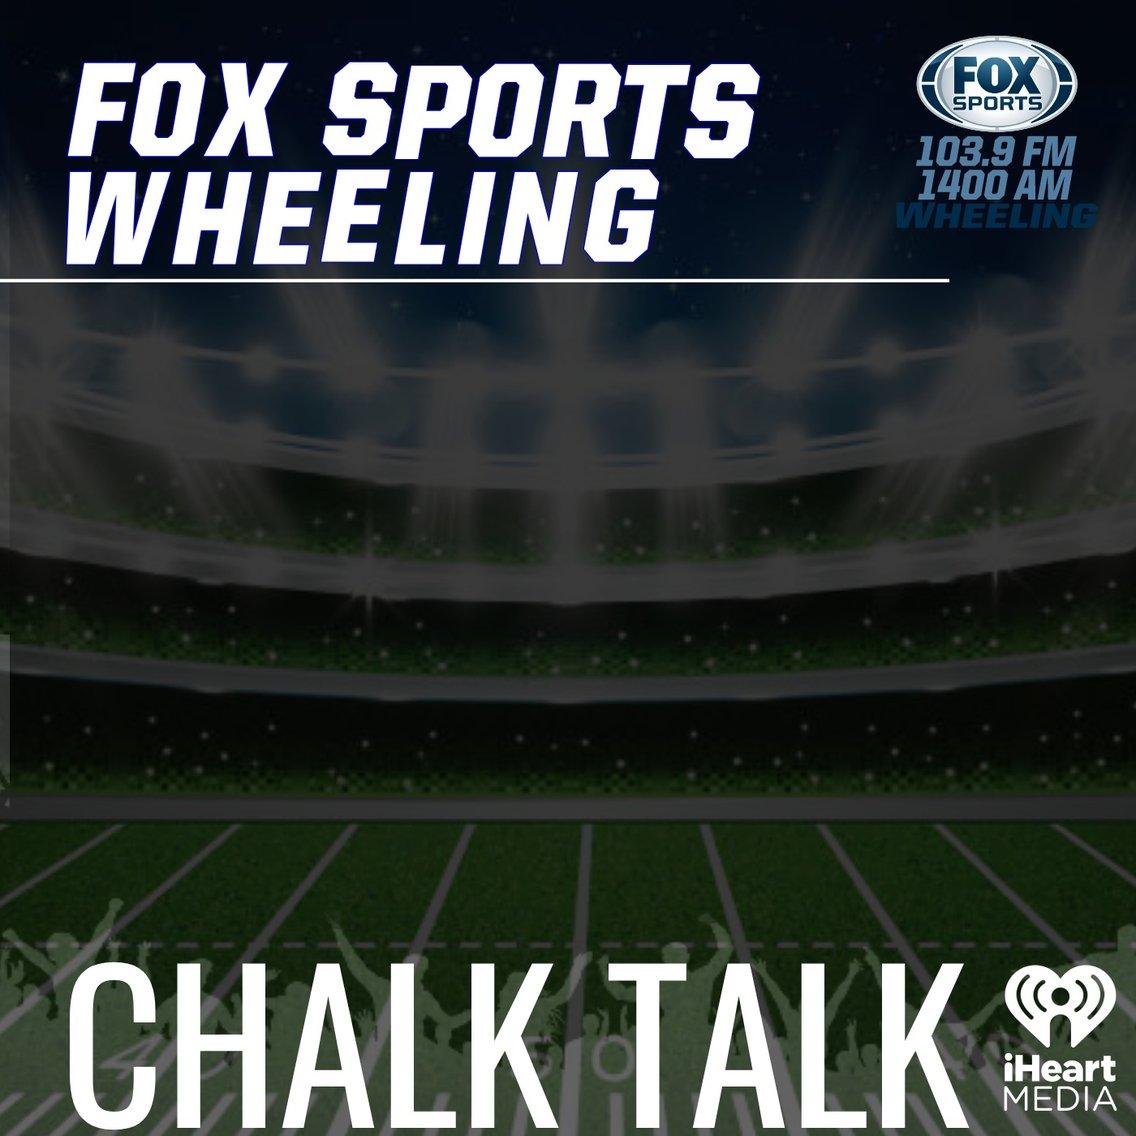 Fox Sports Wheeling Chalk Talk Podcast - Cover Image